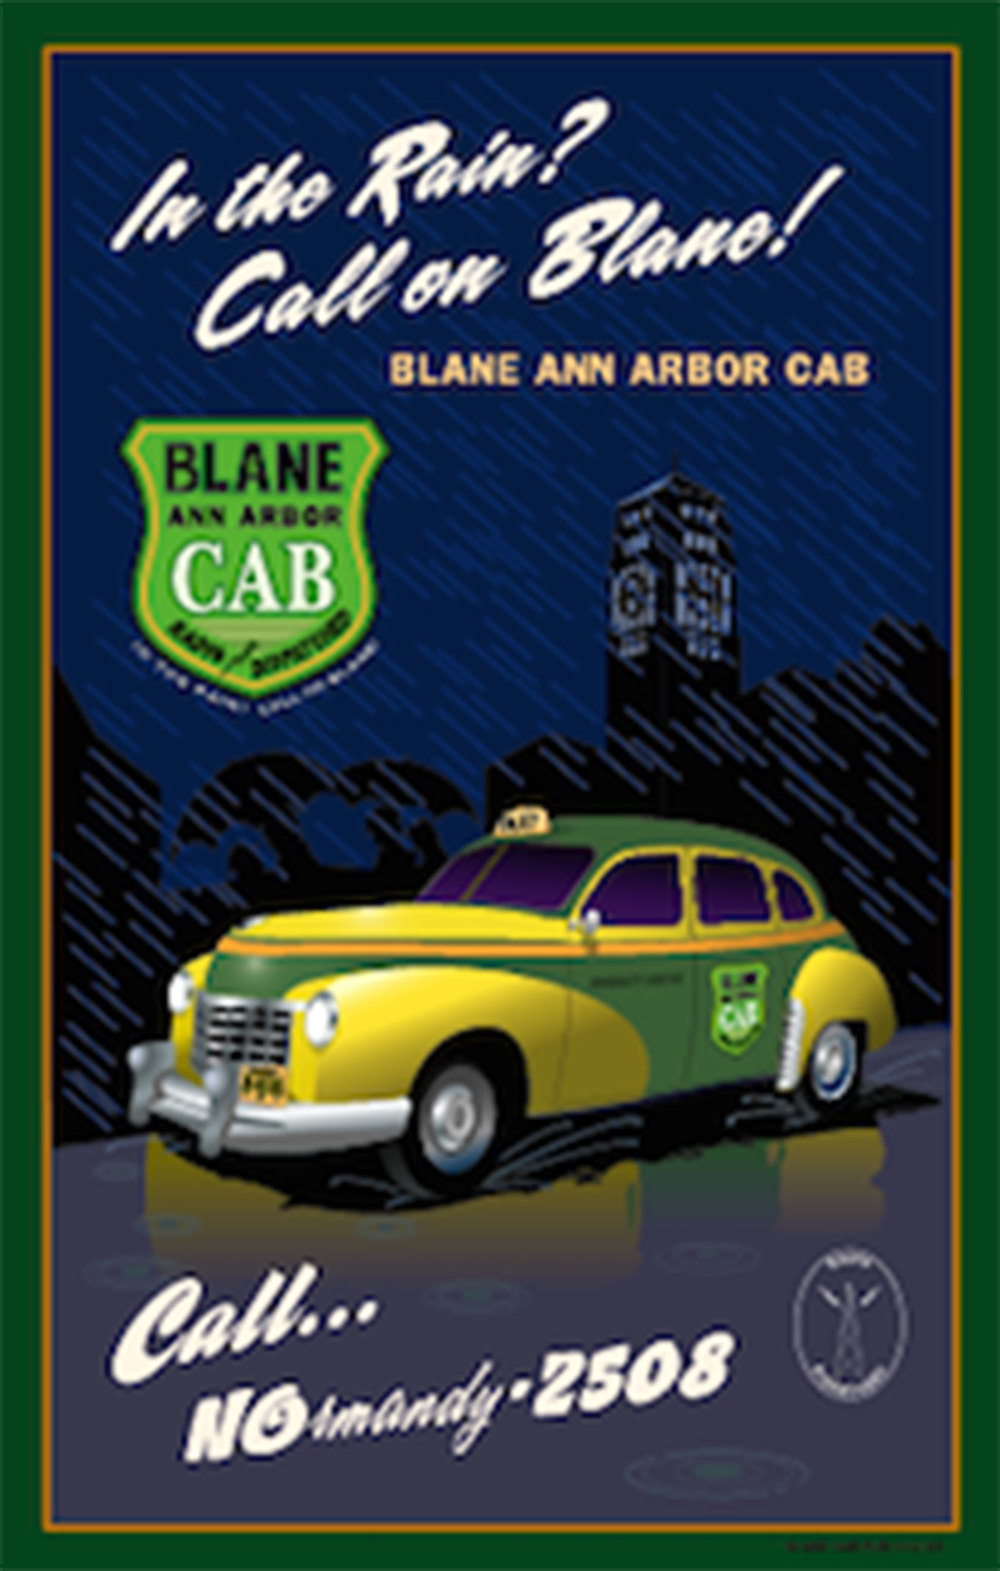 Blane Ann Arbor Cab Poster